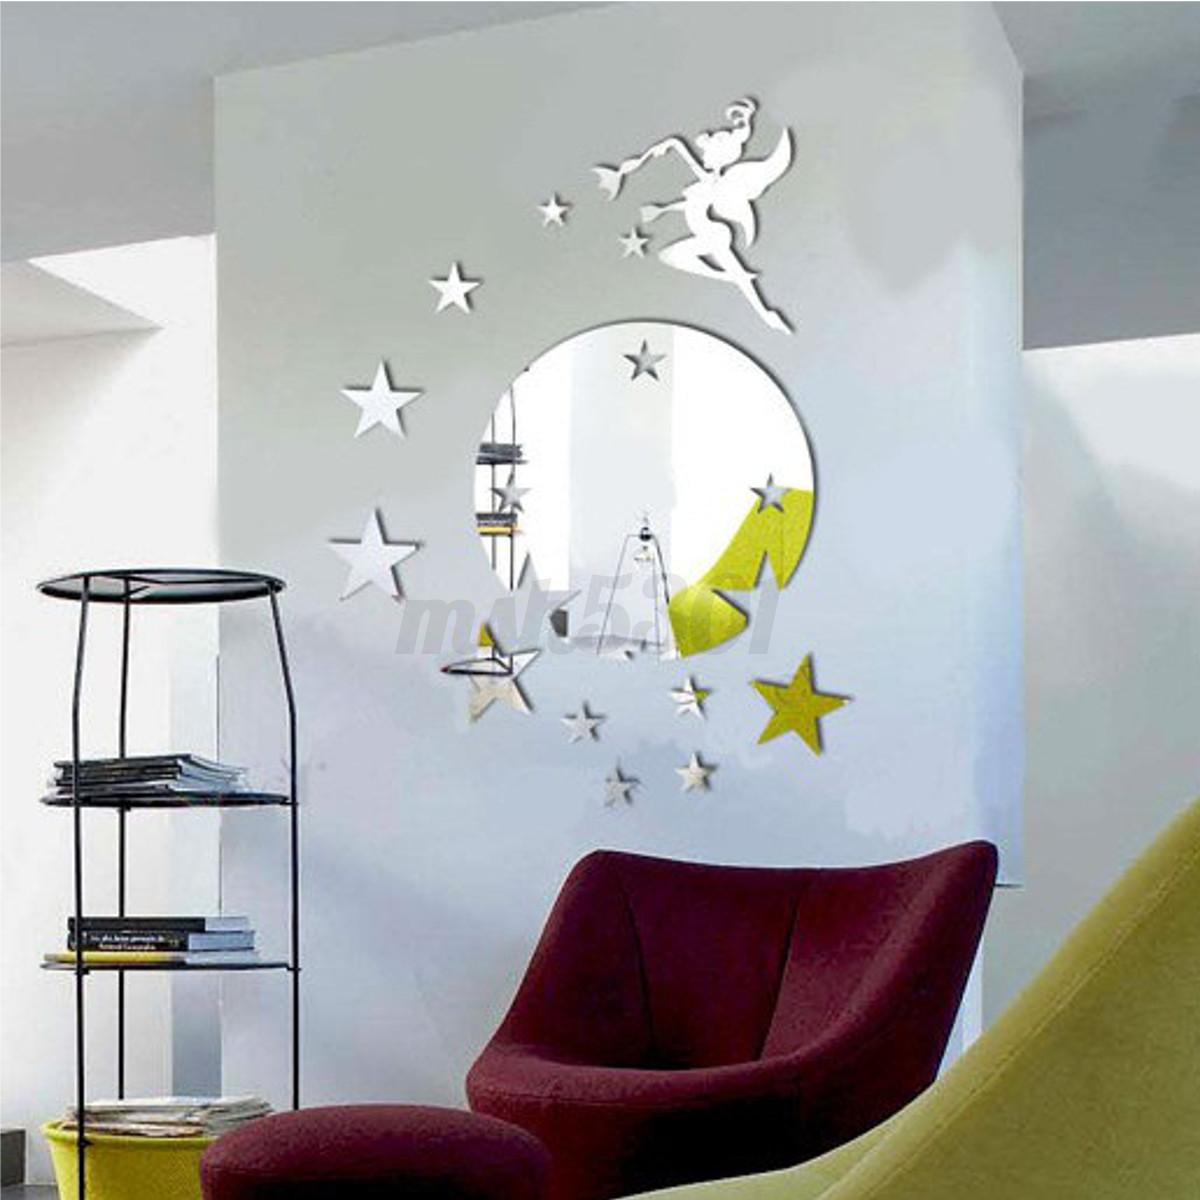 Diy 3d mirror fairy star butterfly acrylic removable home for Acrylic wall art